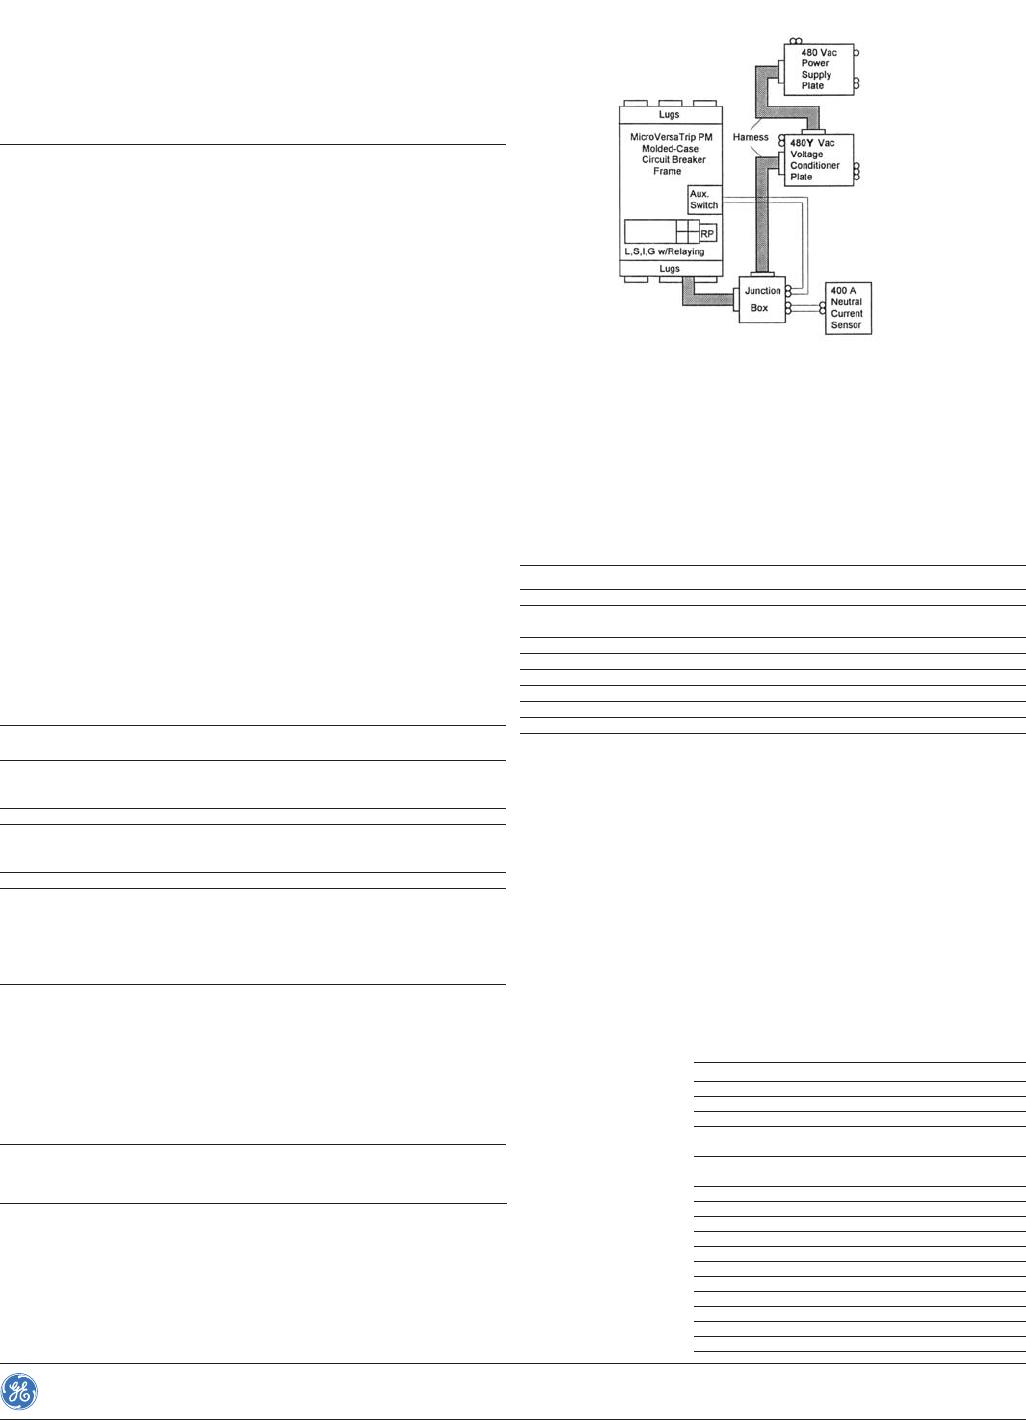 03 Bl 1000449754 Catalog Mag Ic Contactor Wiring Diagram In Addition Car Diagrams Pdf Geelectricalcom Buylogcatalog